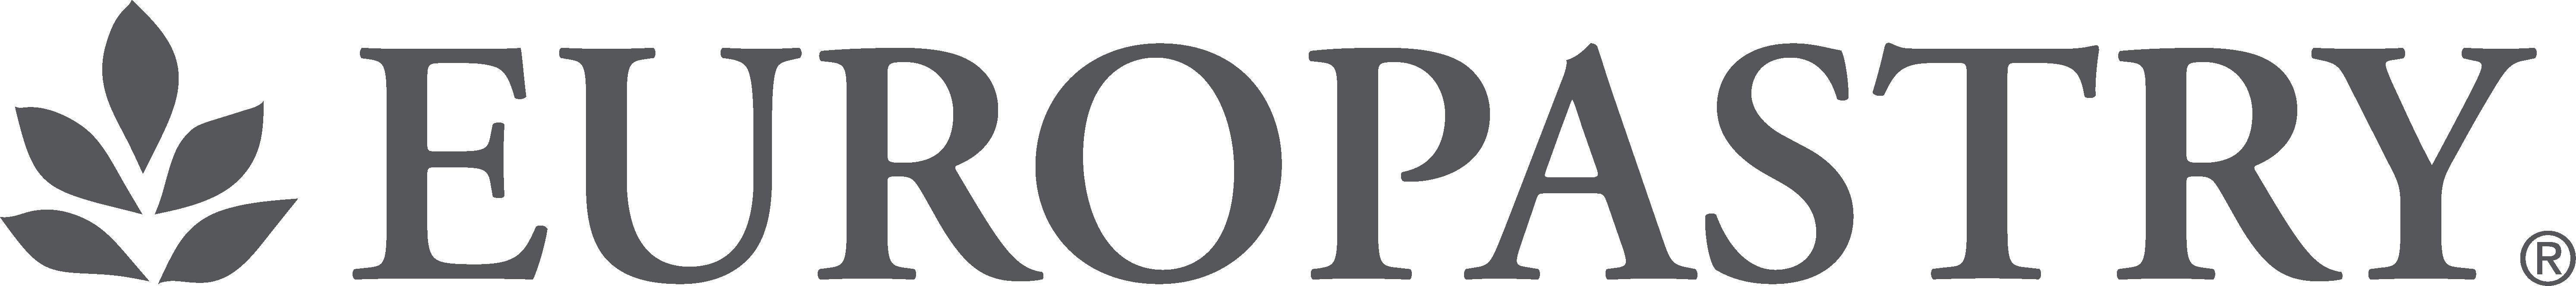 Foto de Logo Europastry